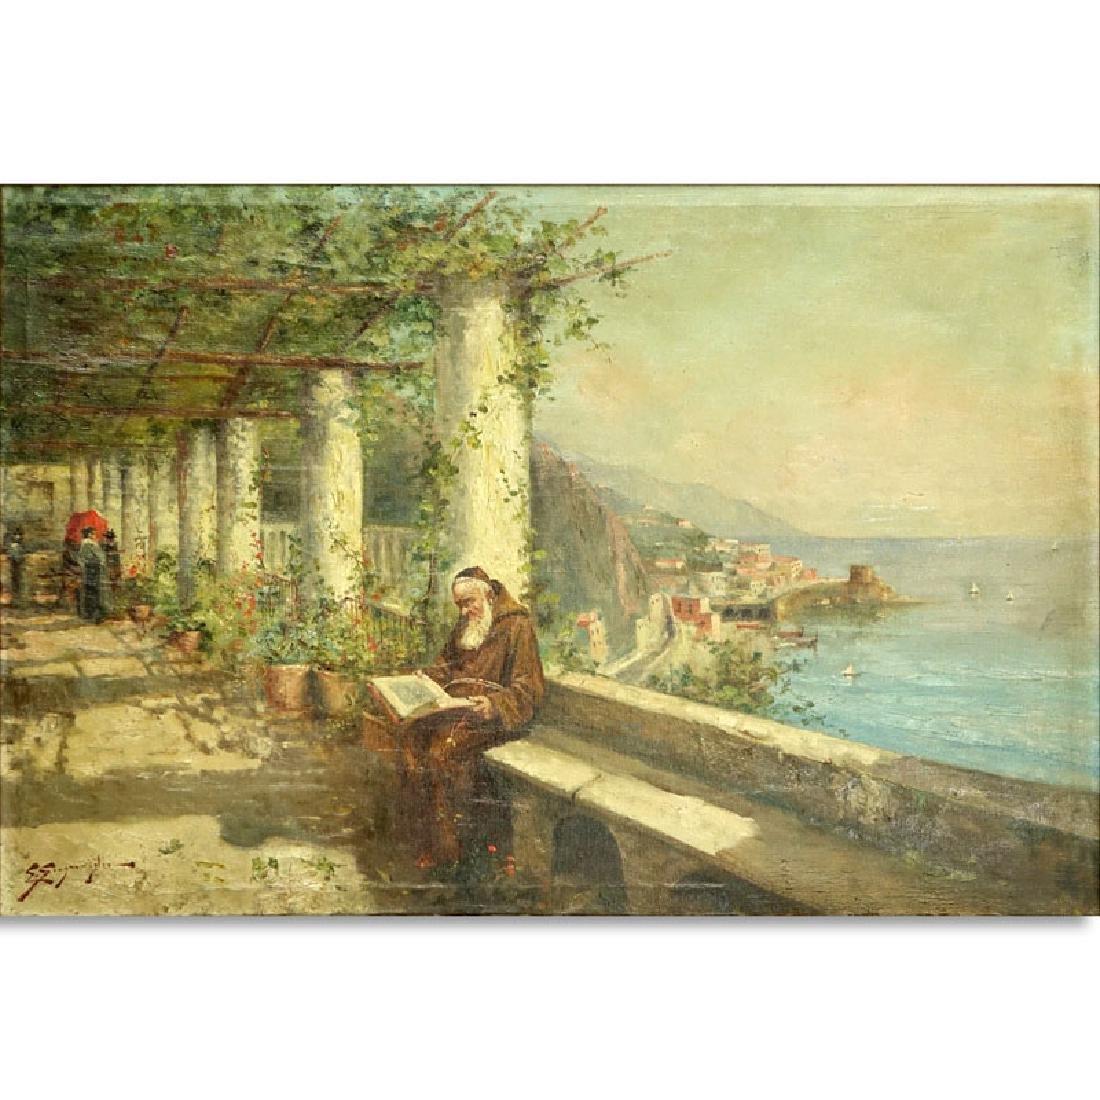 Edwardo Scognamiglio, Italian (19/20th century) Oil on